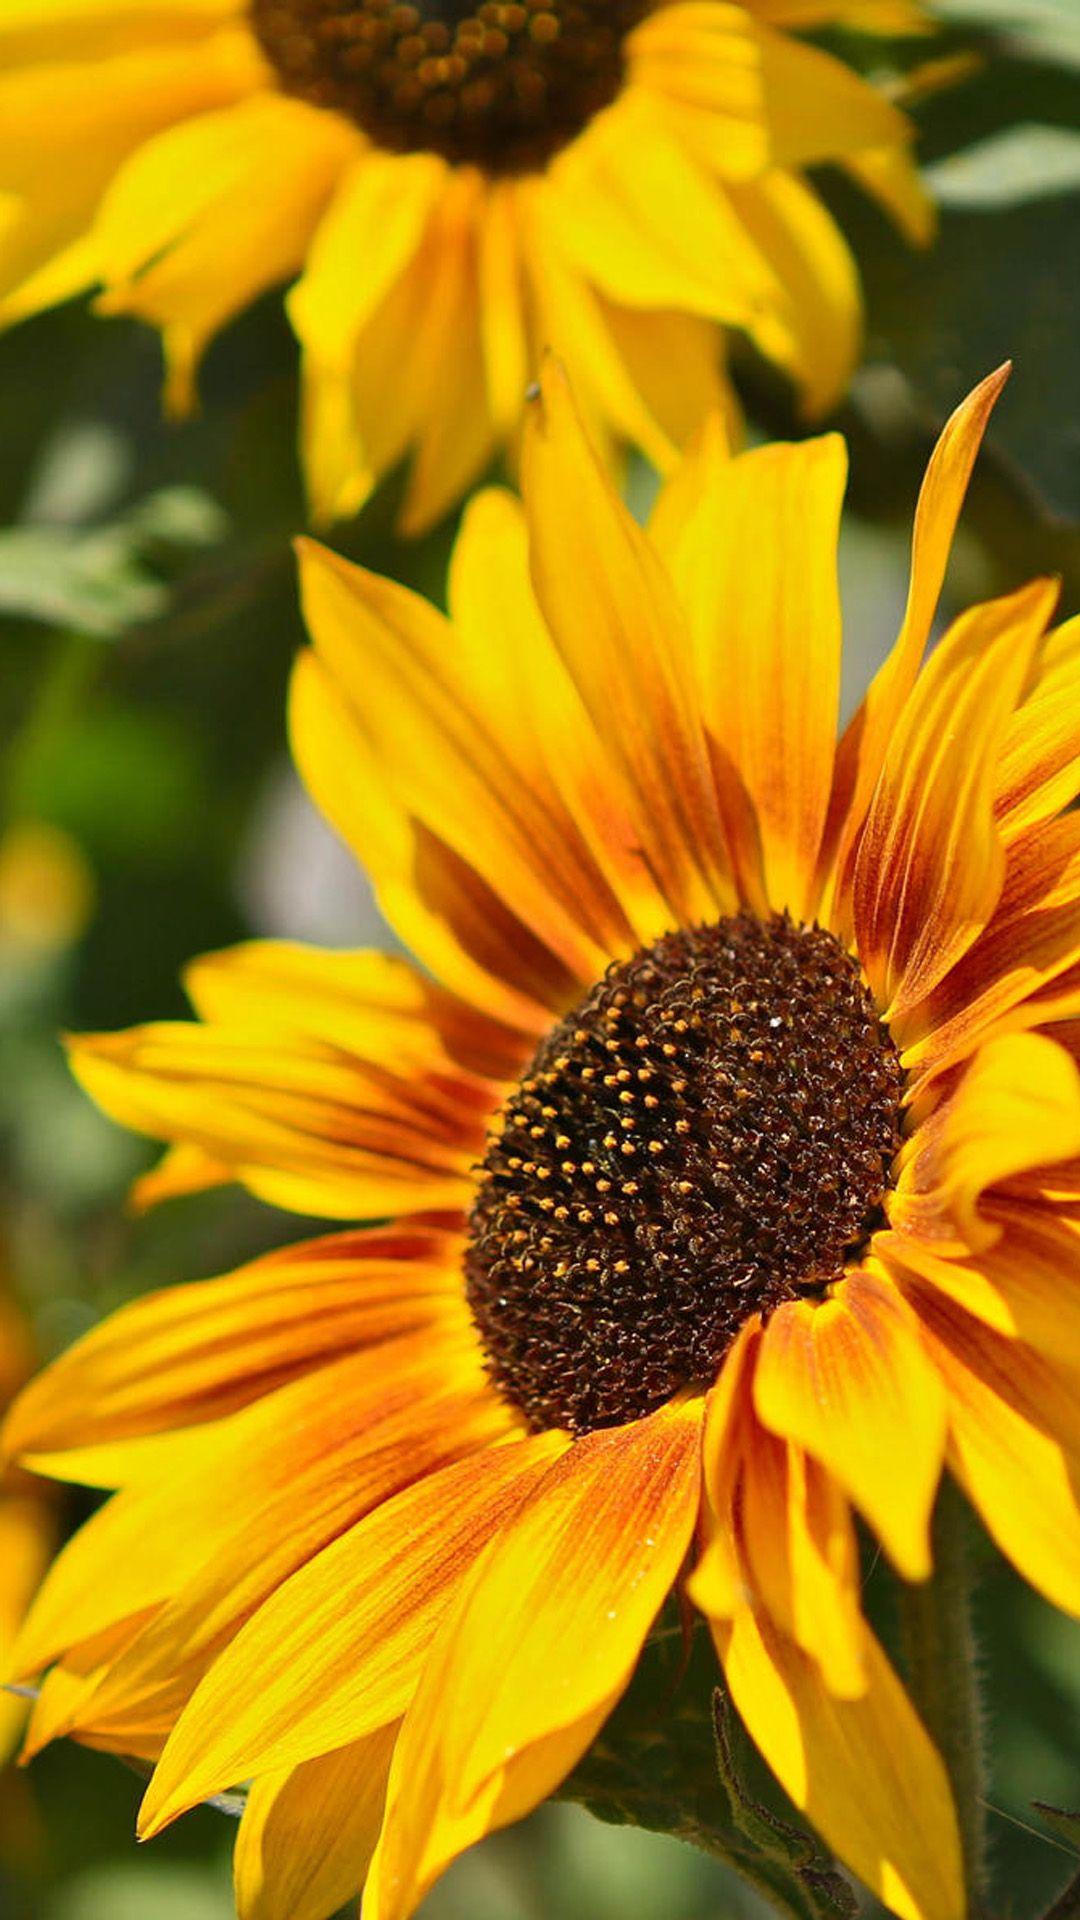 Sunflower. 25+ Closeup Flowers Photography iPhone